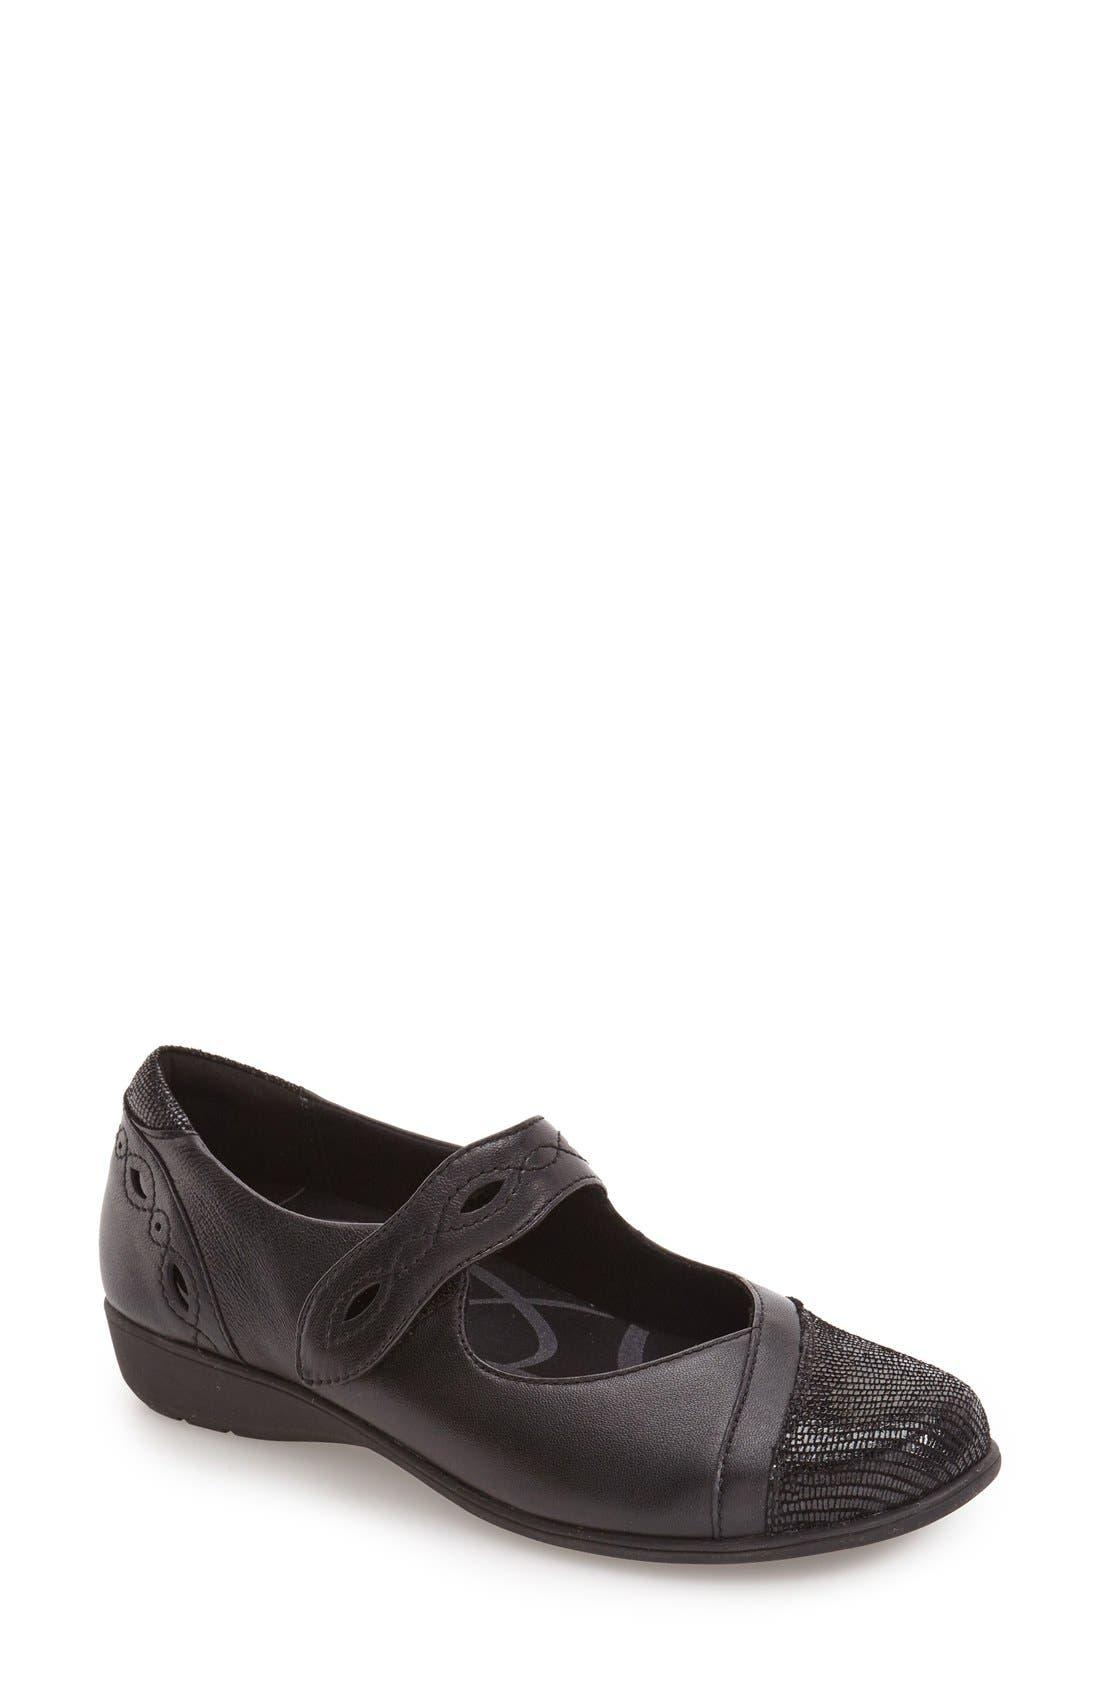 'Alana' Mary Jane Flat,                         Main,                         color, Black Leather